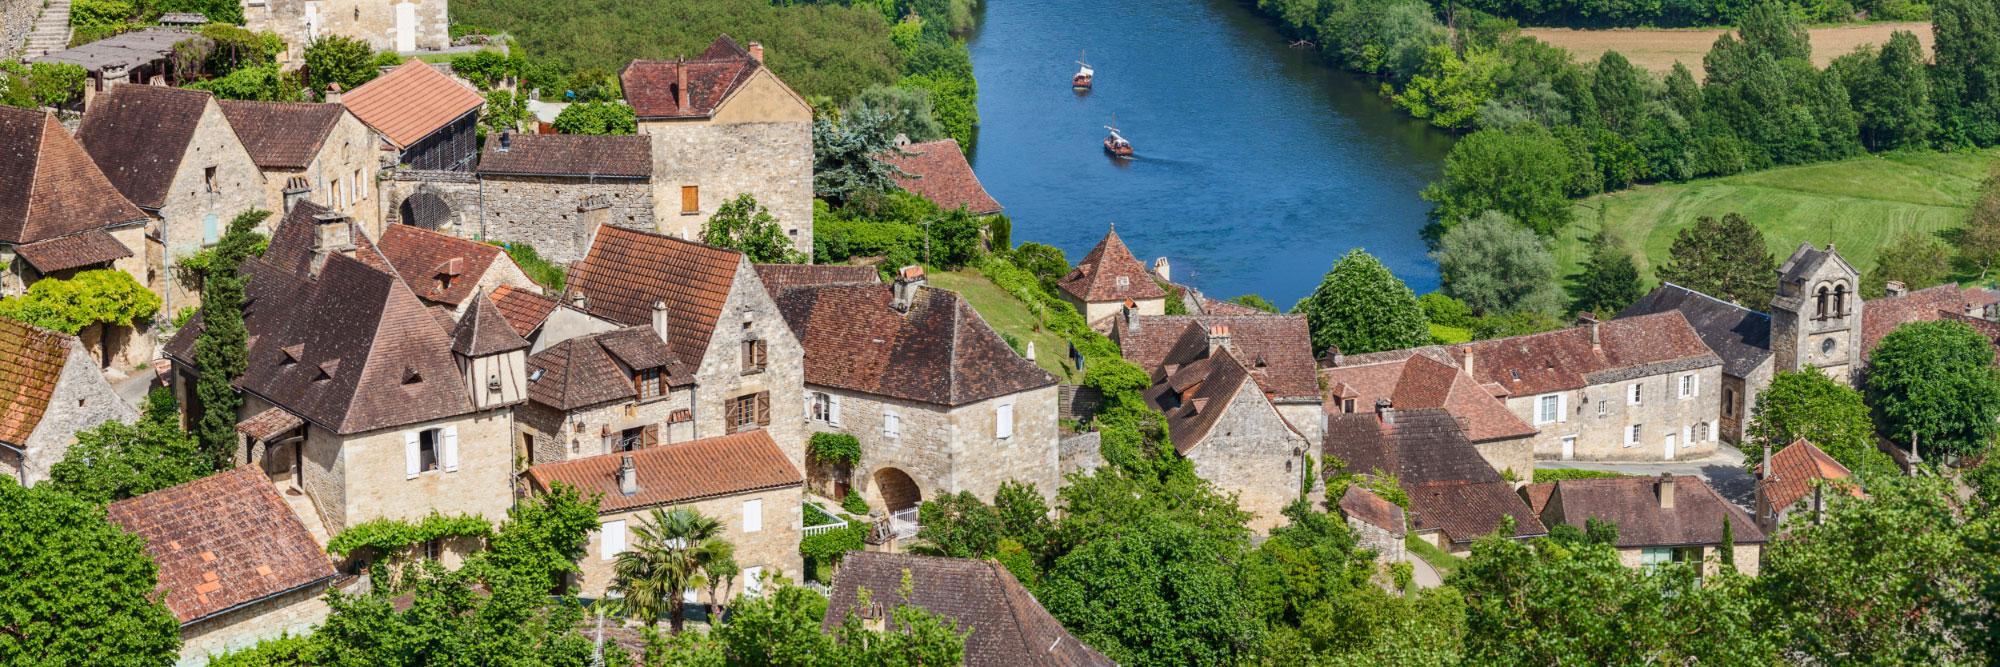 Castelnaud-la-Chapelle dominant la Dordogne